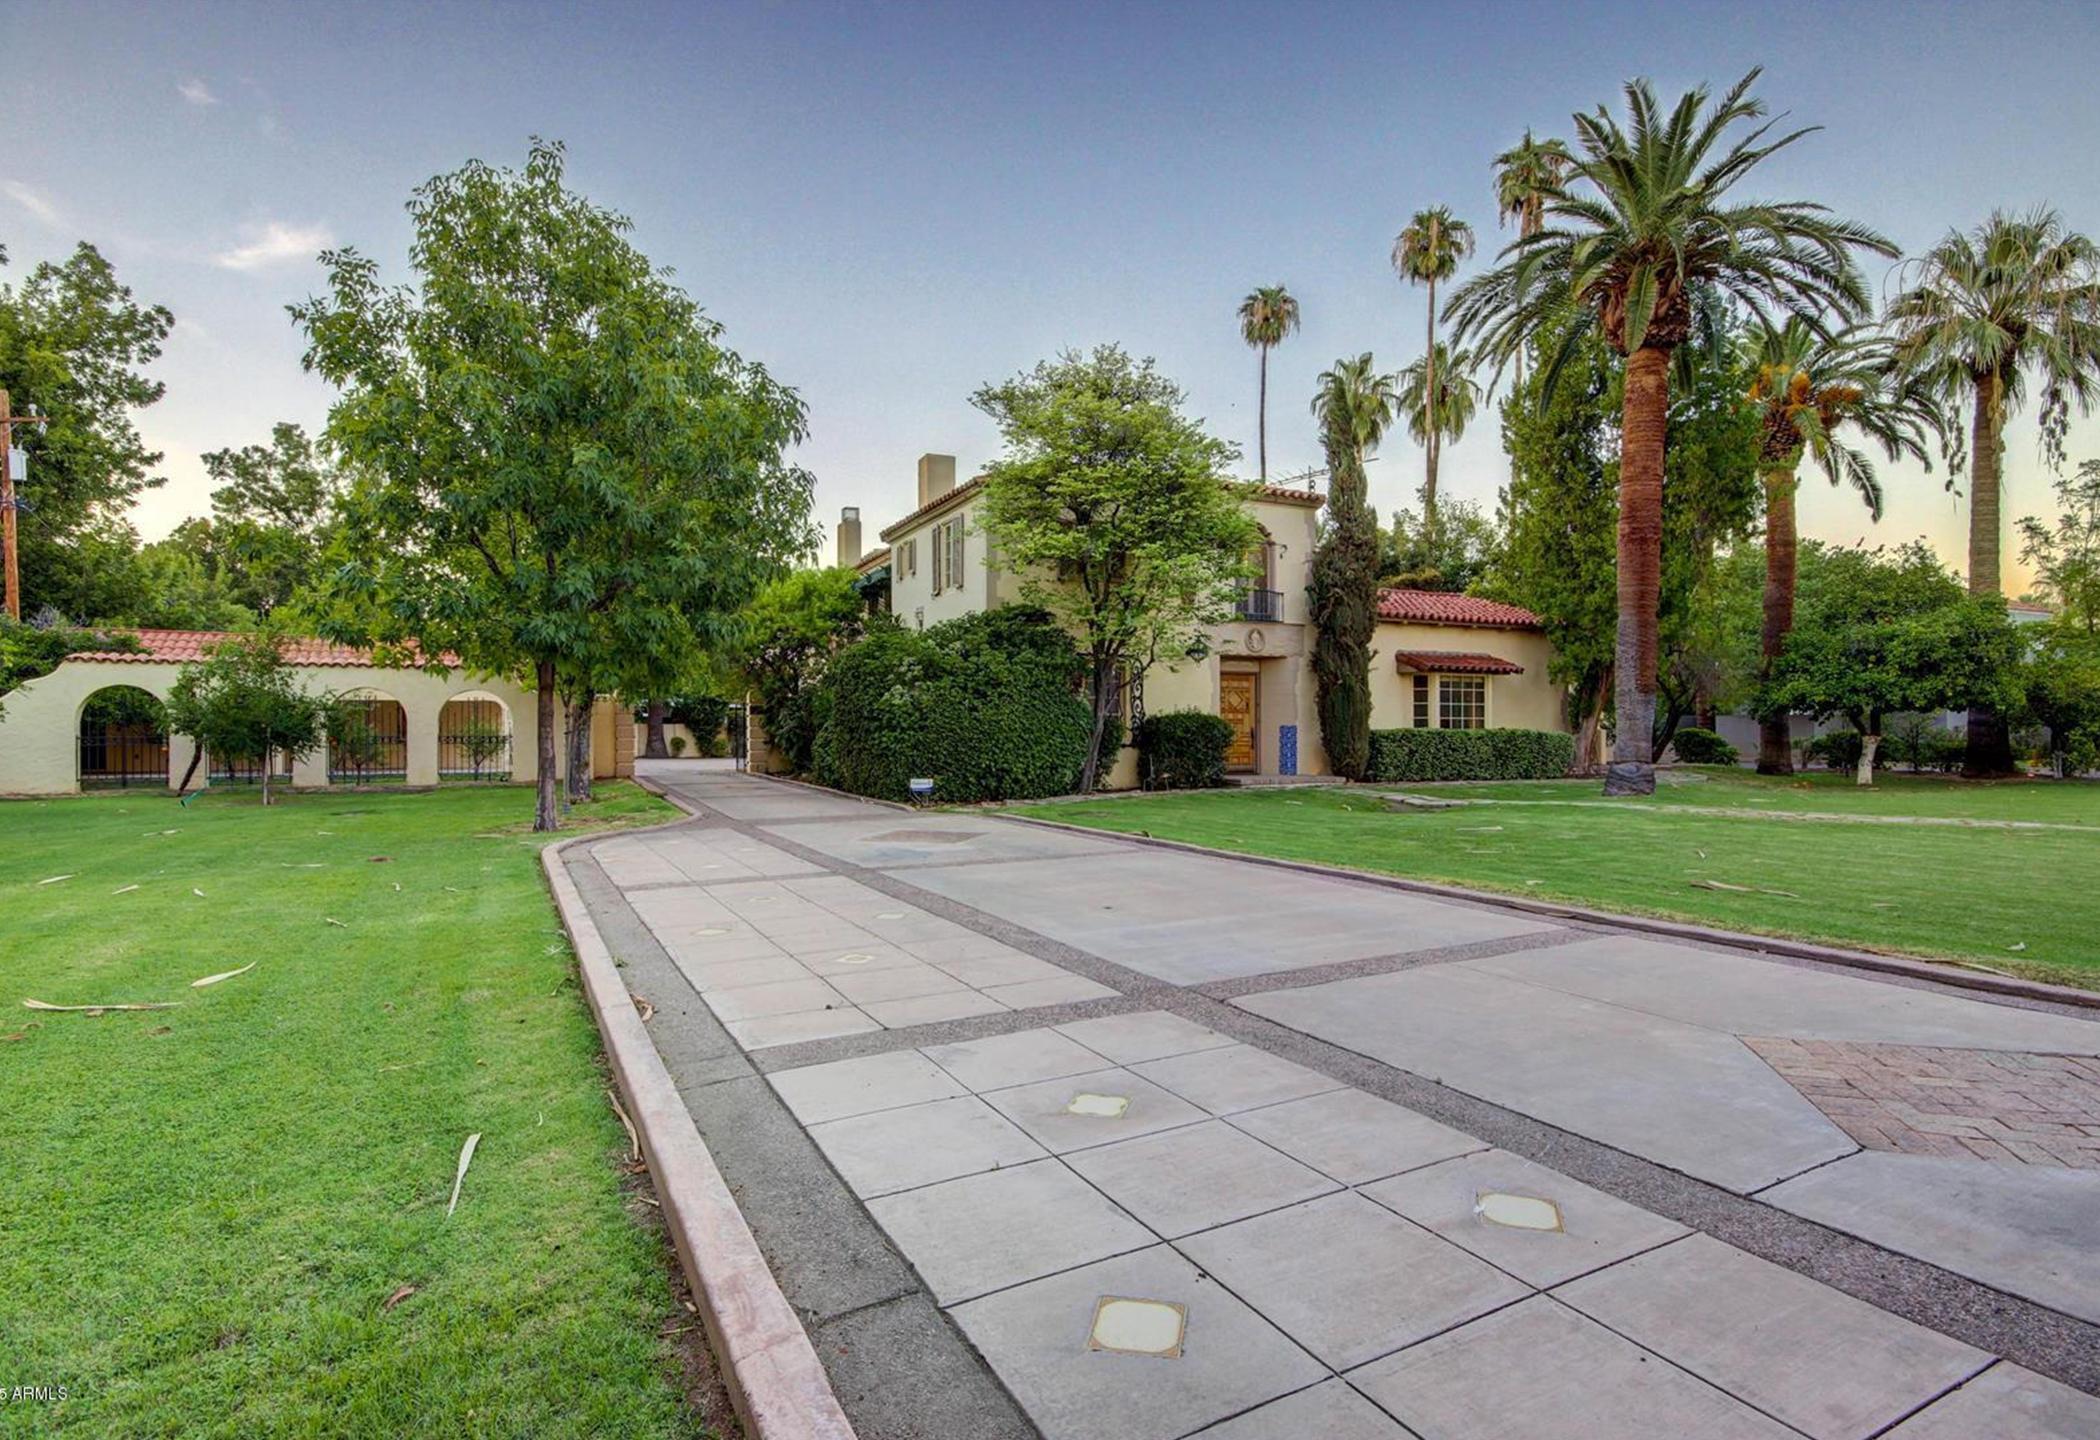 The Alvarado Historic District Real Estate For Sale In